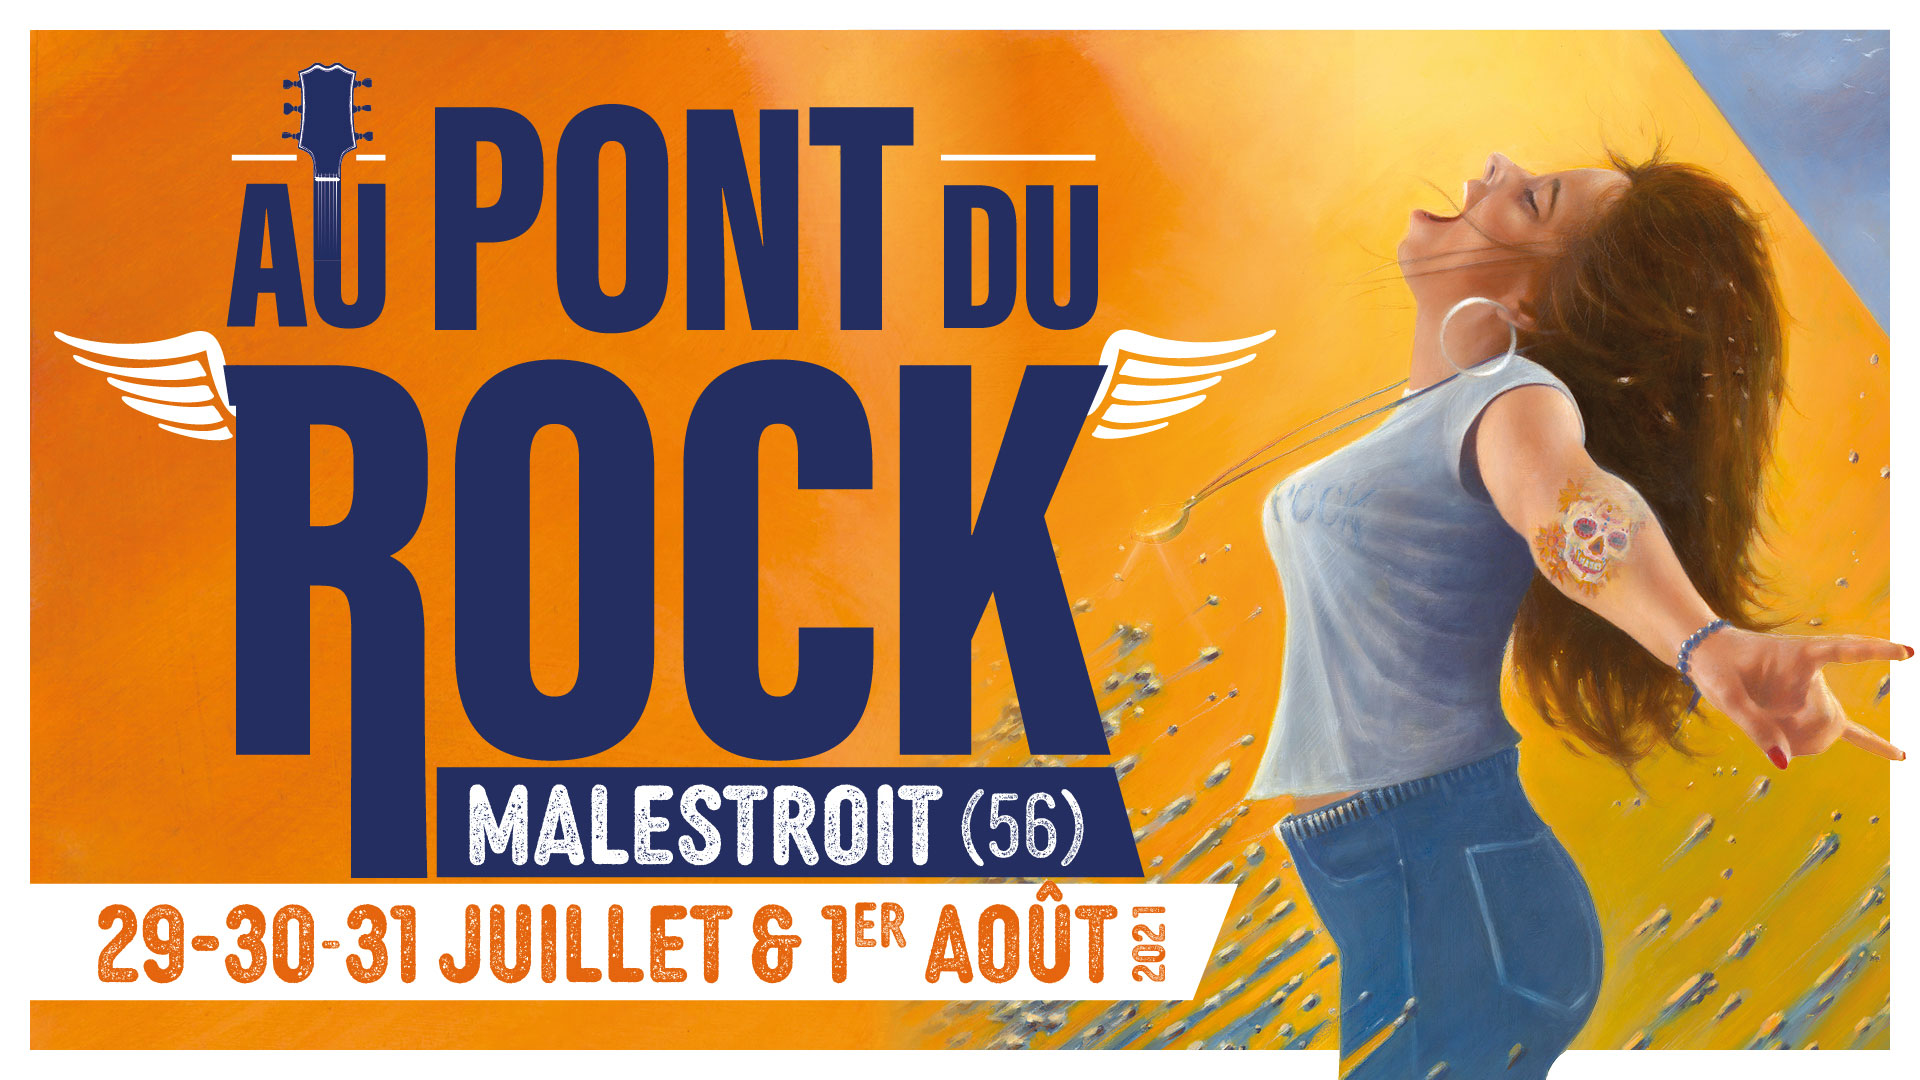 Festival Au Pont du Rock, 29, 30, 31 juillet et 1er août 2021